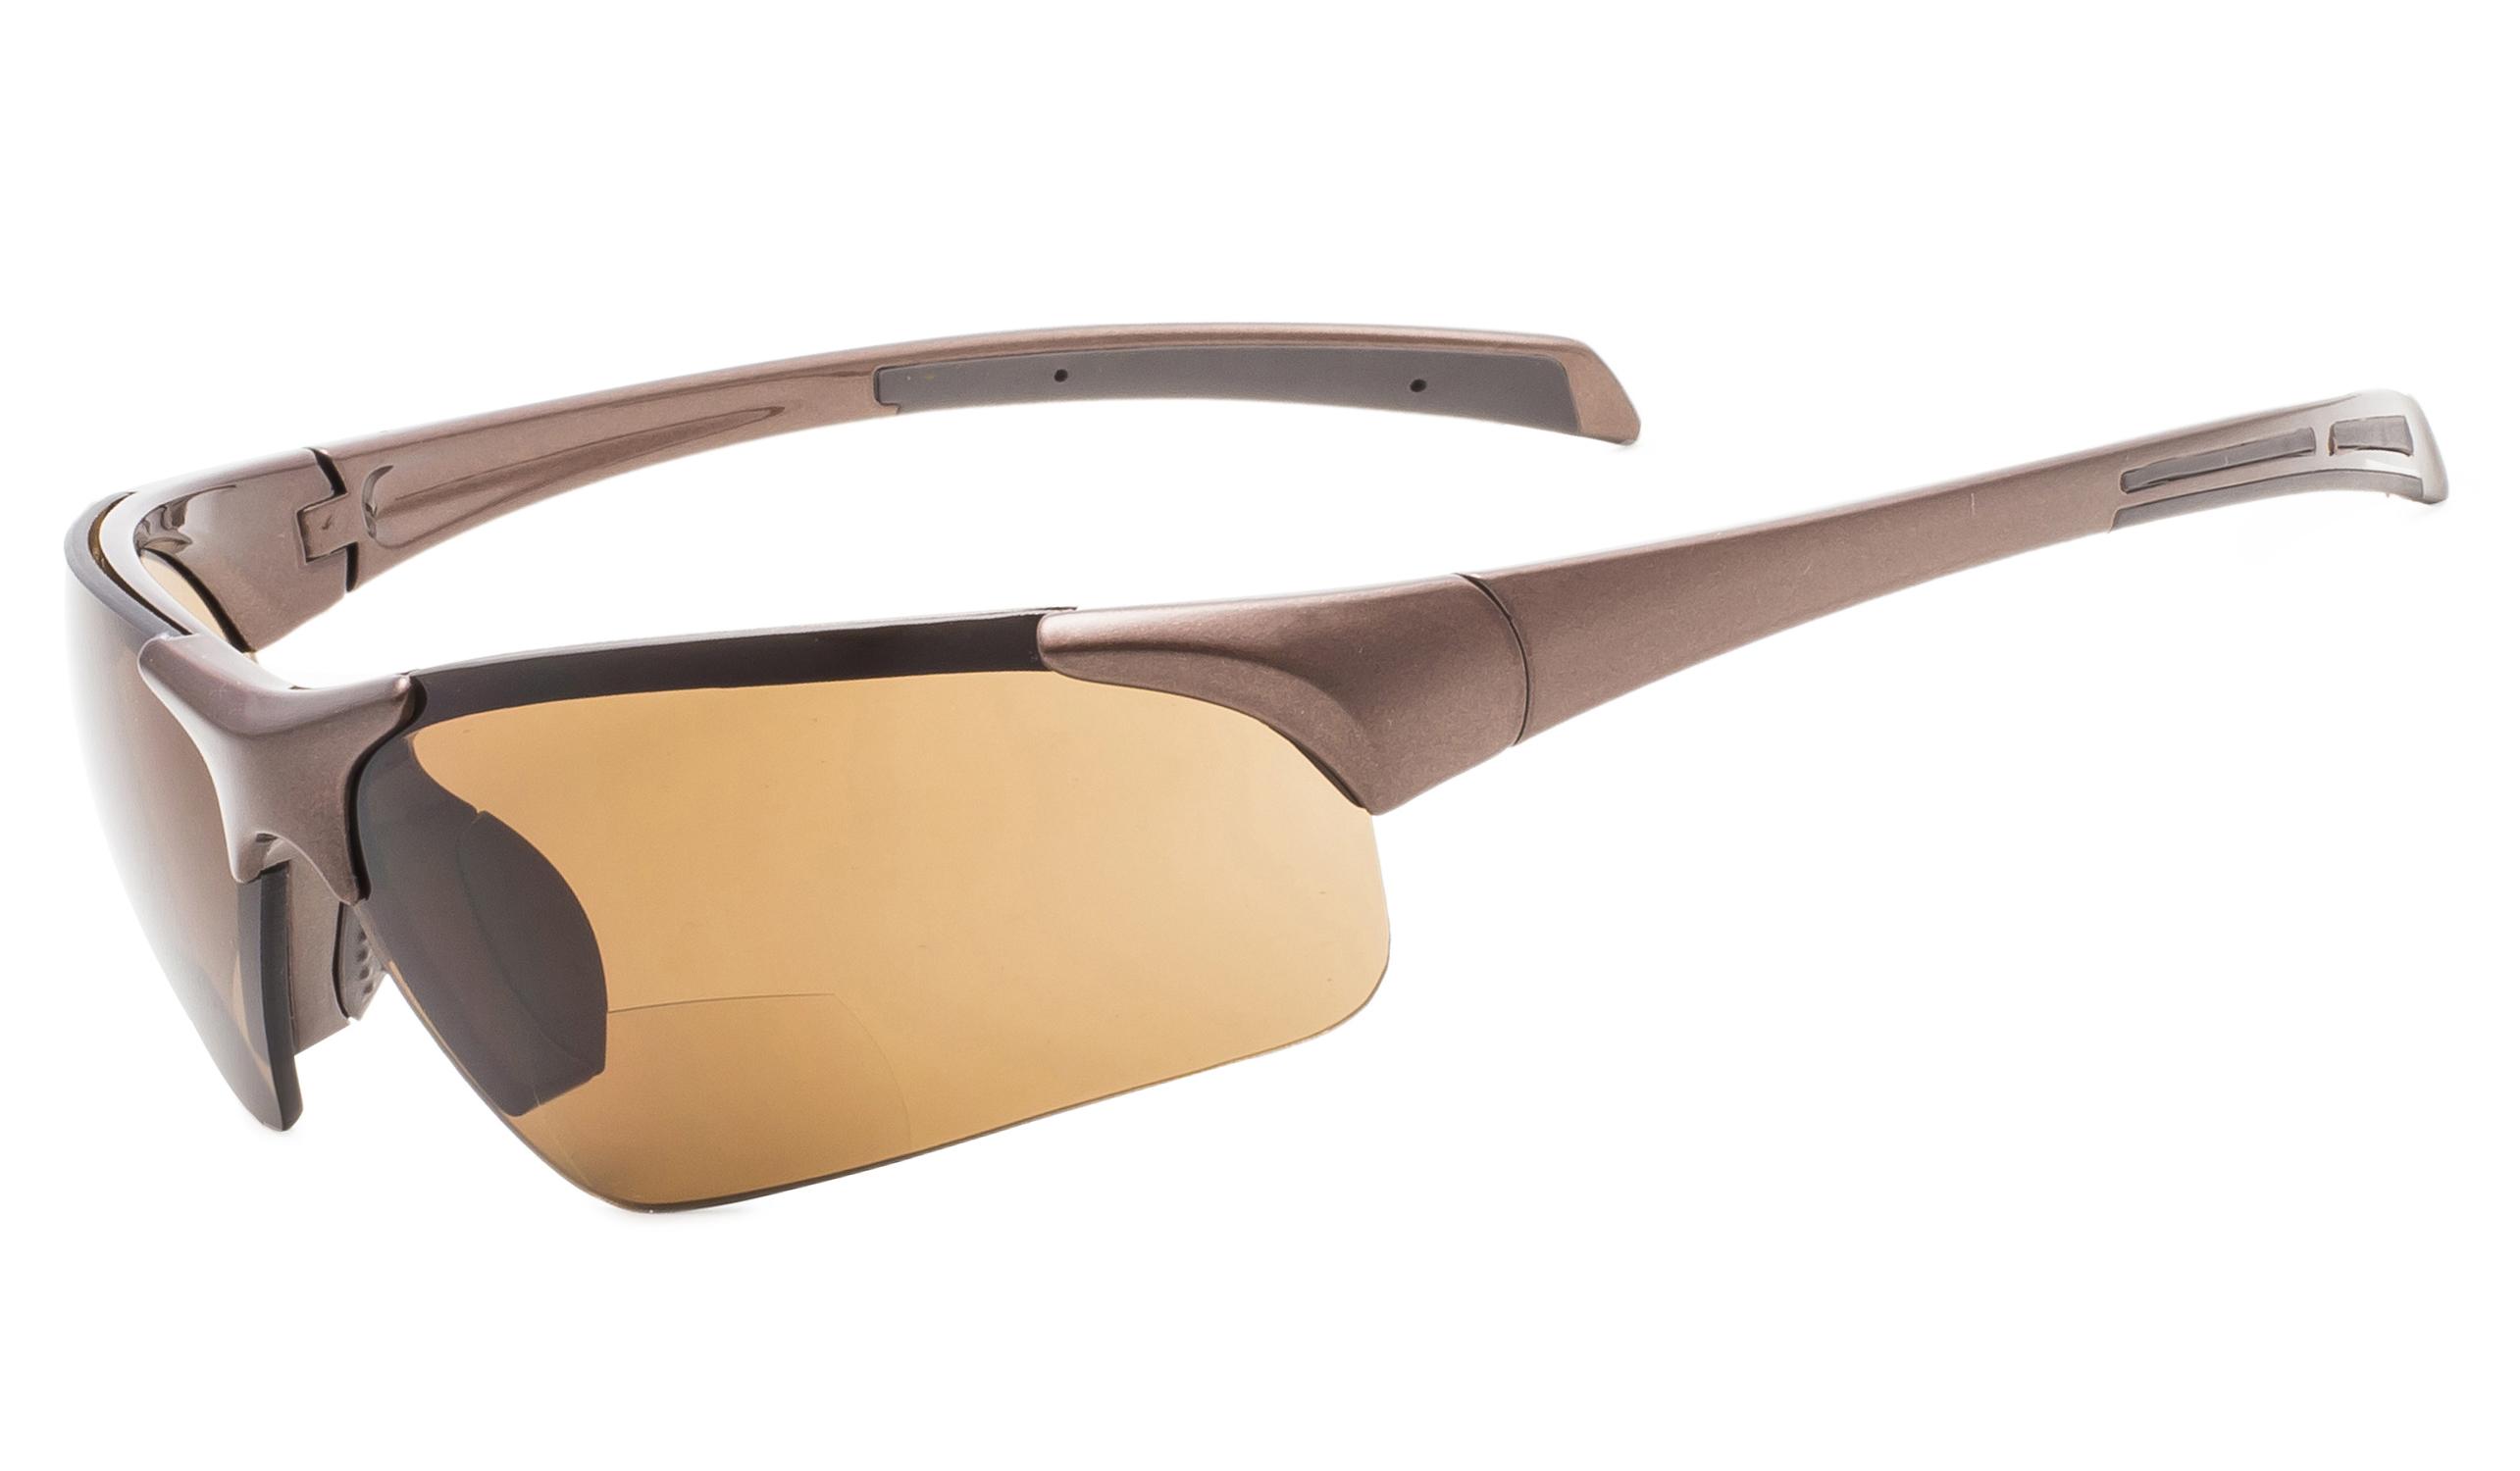 3f00d53af0 Eyekepper Bifocal Sunglasses UV400 Protection Quality Unbreakable TR90 Frame  Half-rimless TH6186-Bifocal